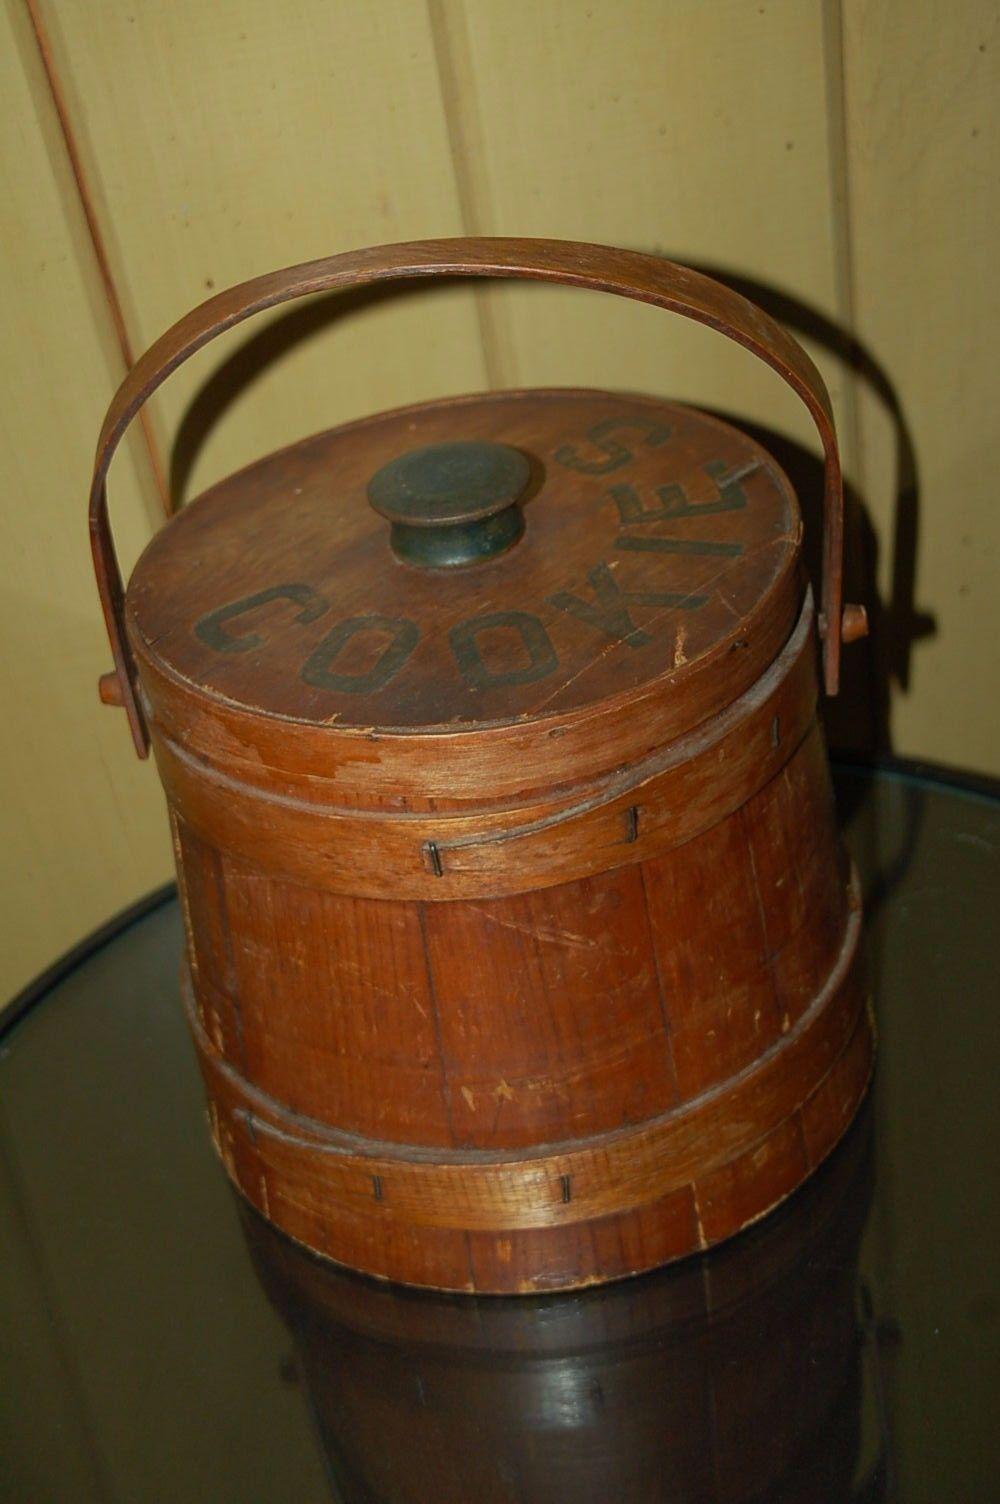 Vintage Wooden Barrel Cookie Jar Container Wood Handle 1950 S Jar Containers Wooden Barrel Cookie Jars